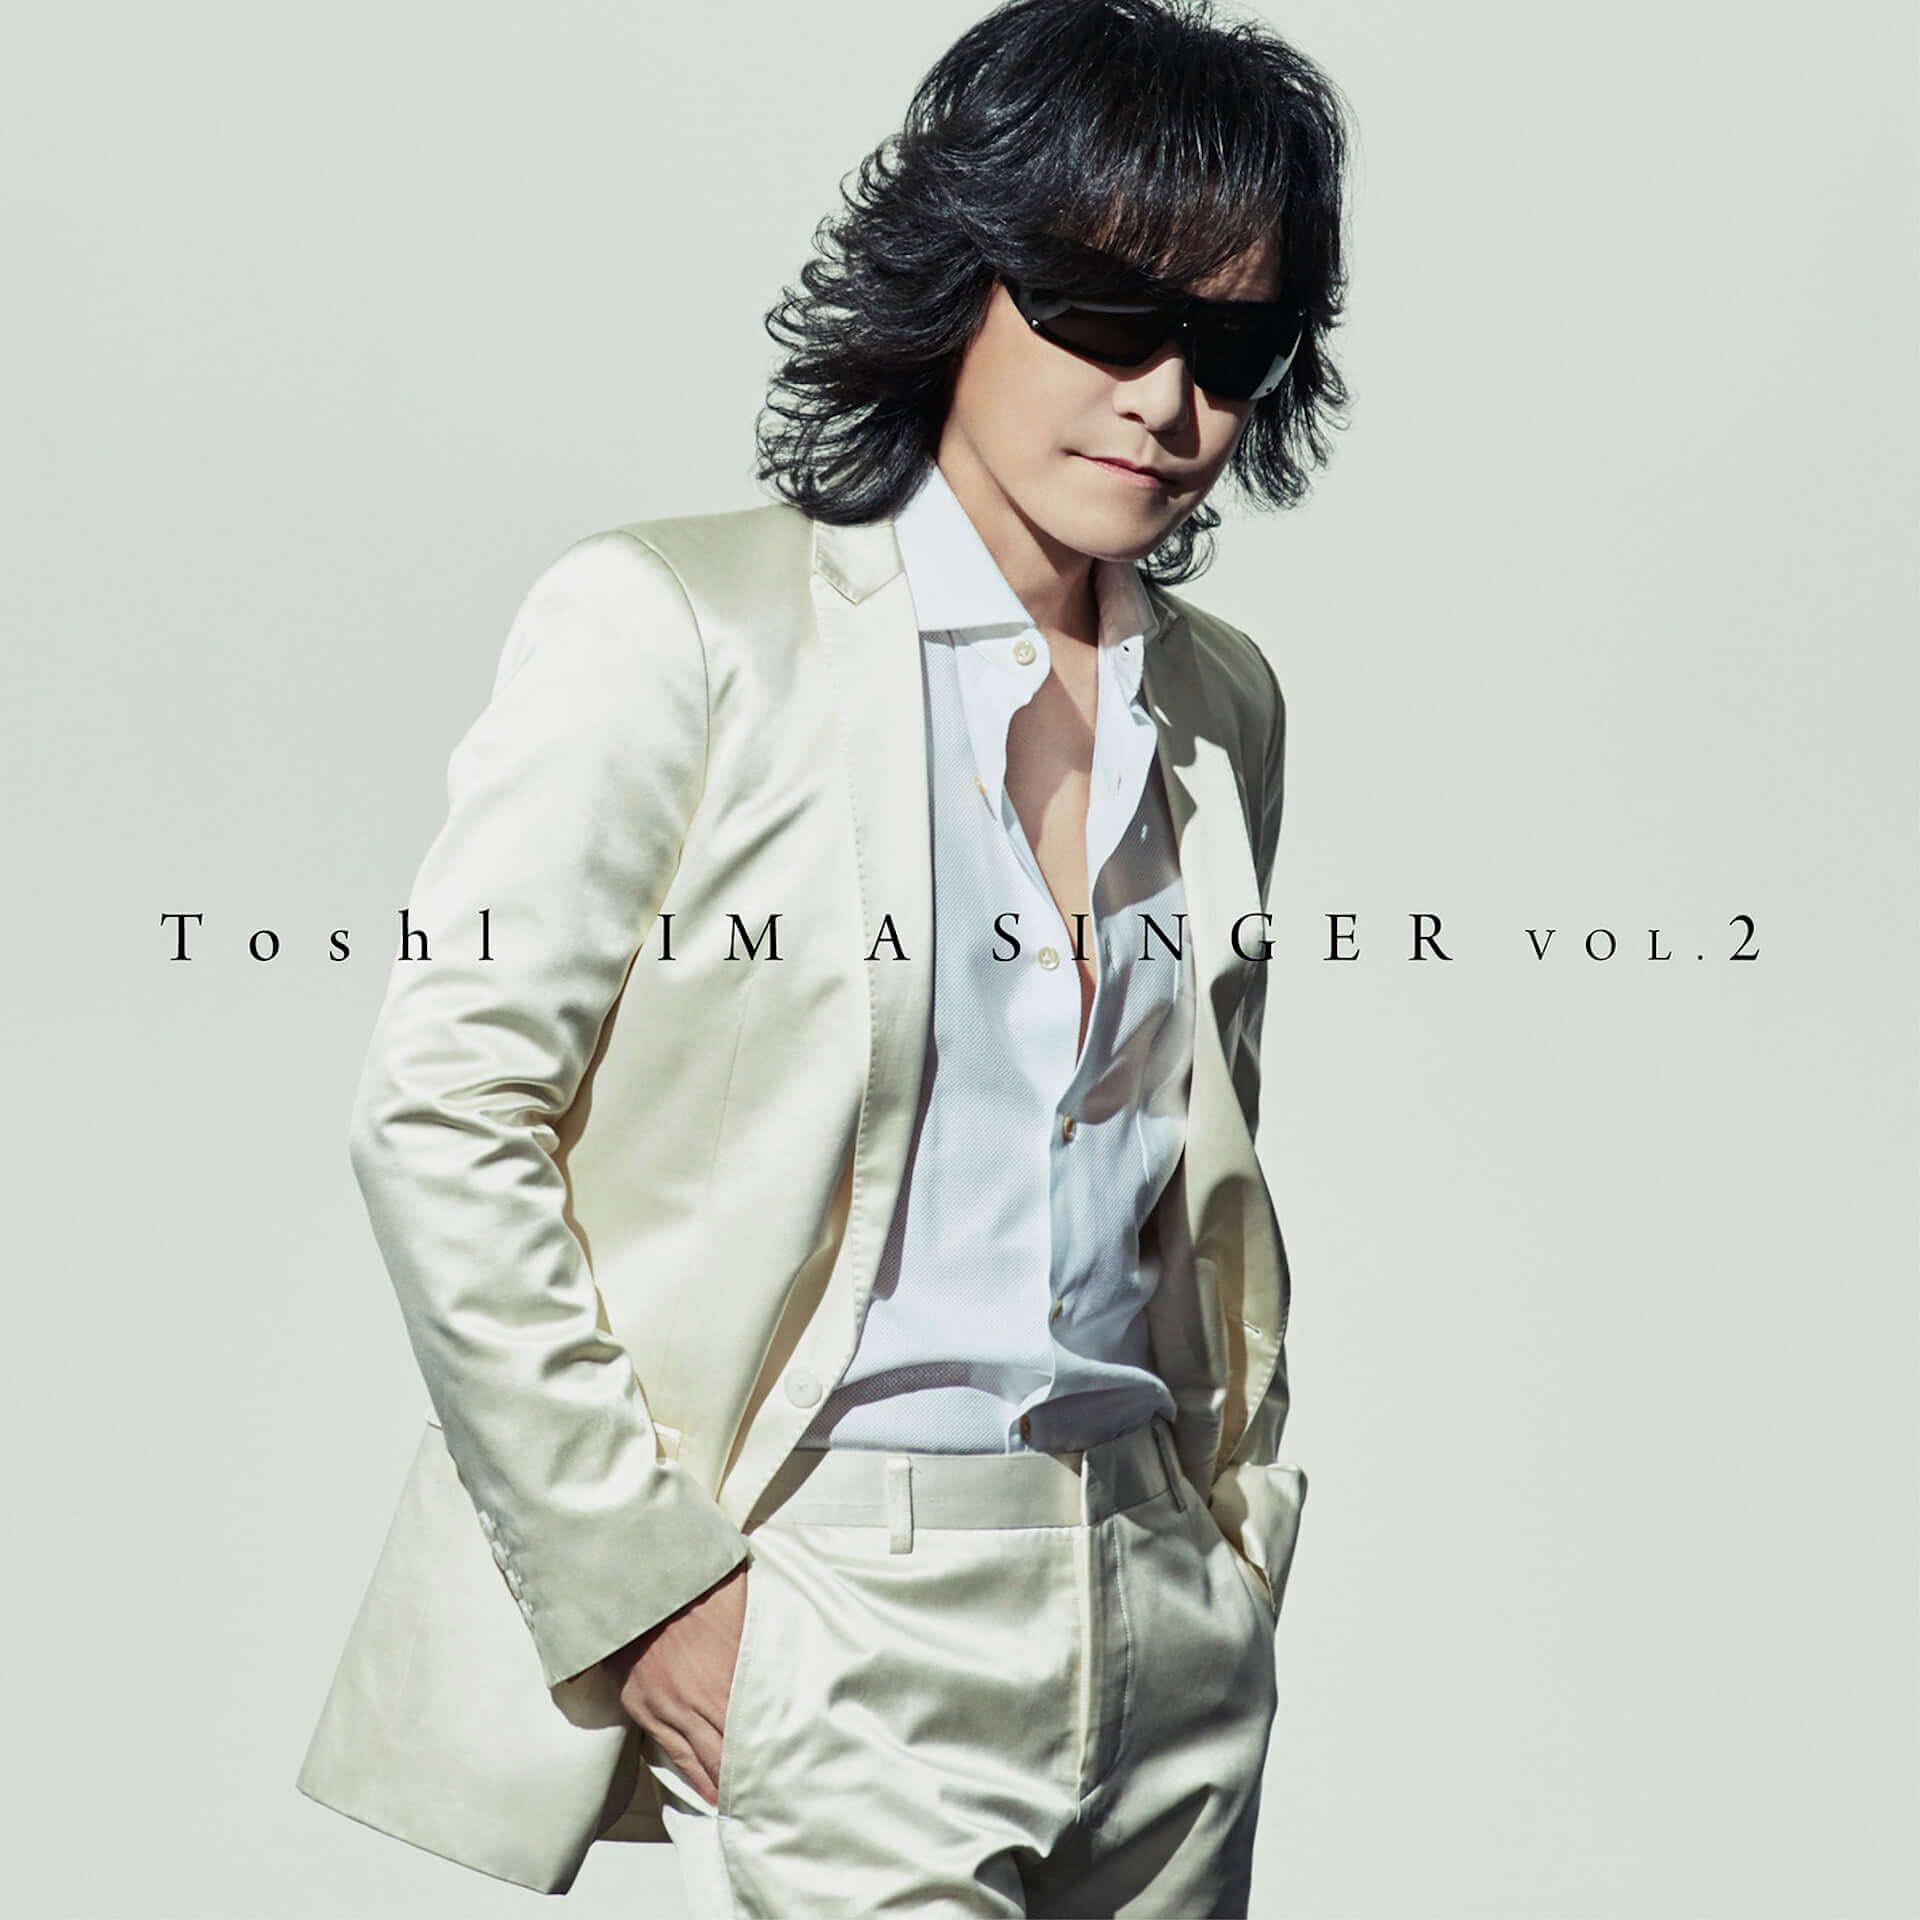 ToshI I'm a singer vol 2